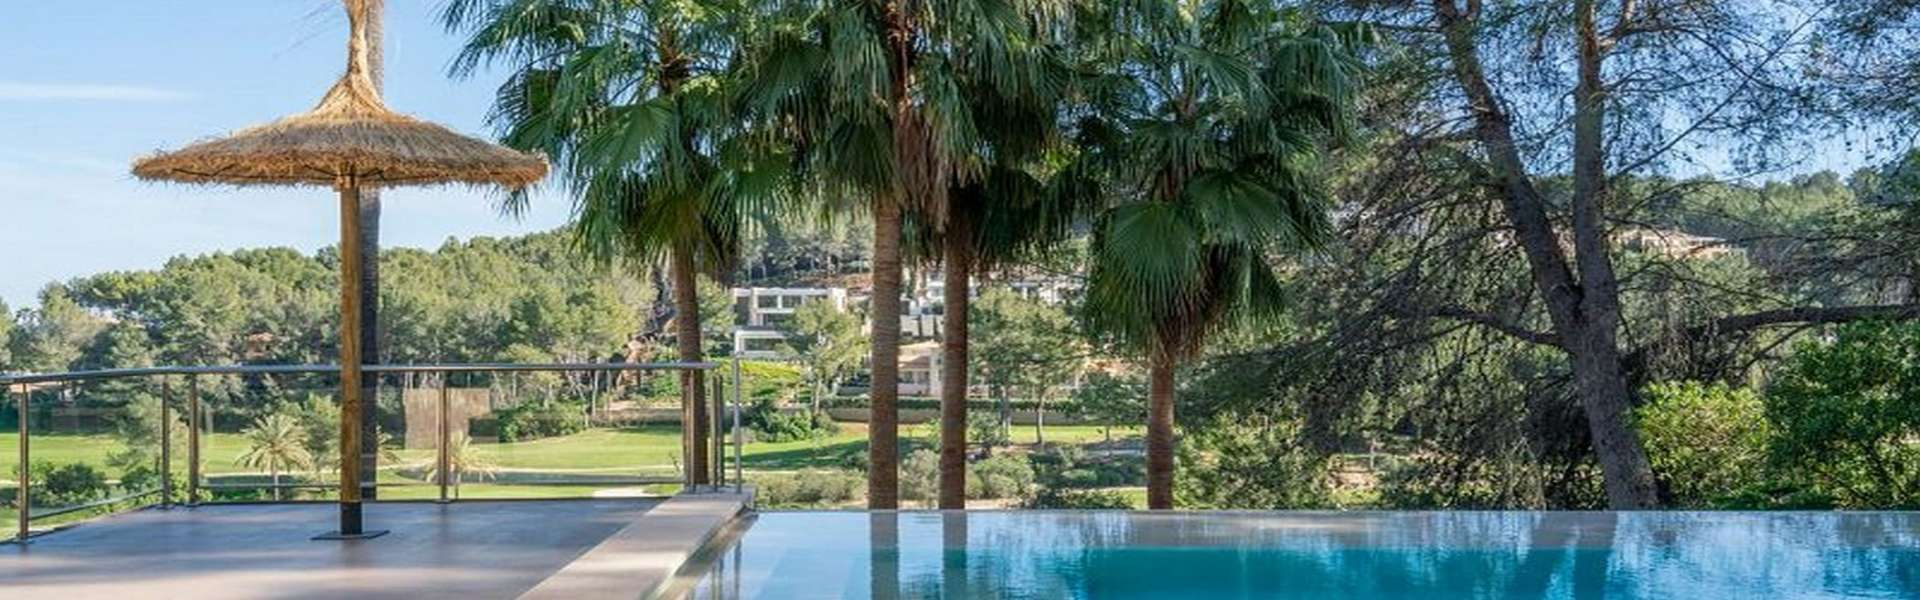 Palma/Son Vida - Fantastic villa with view to the golf course